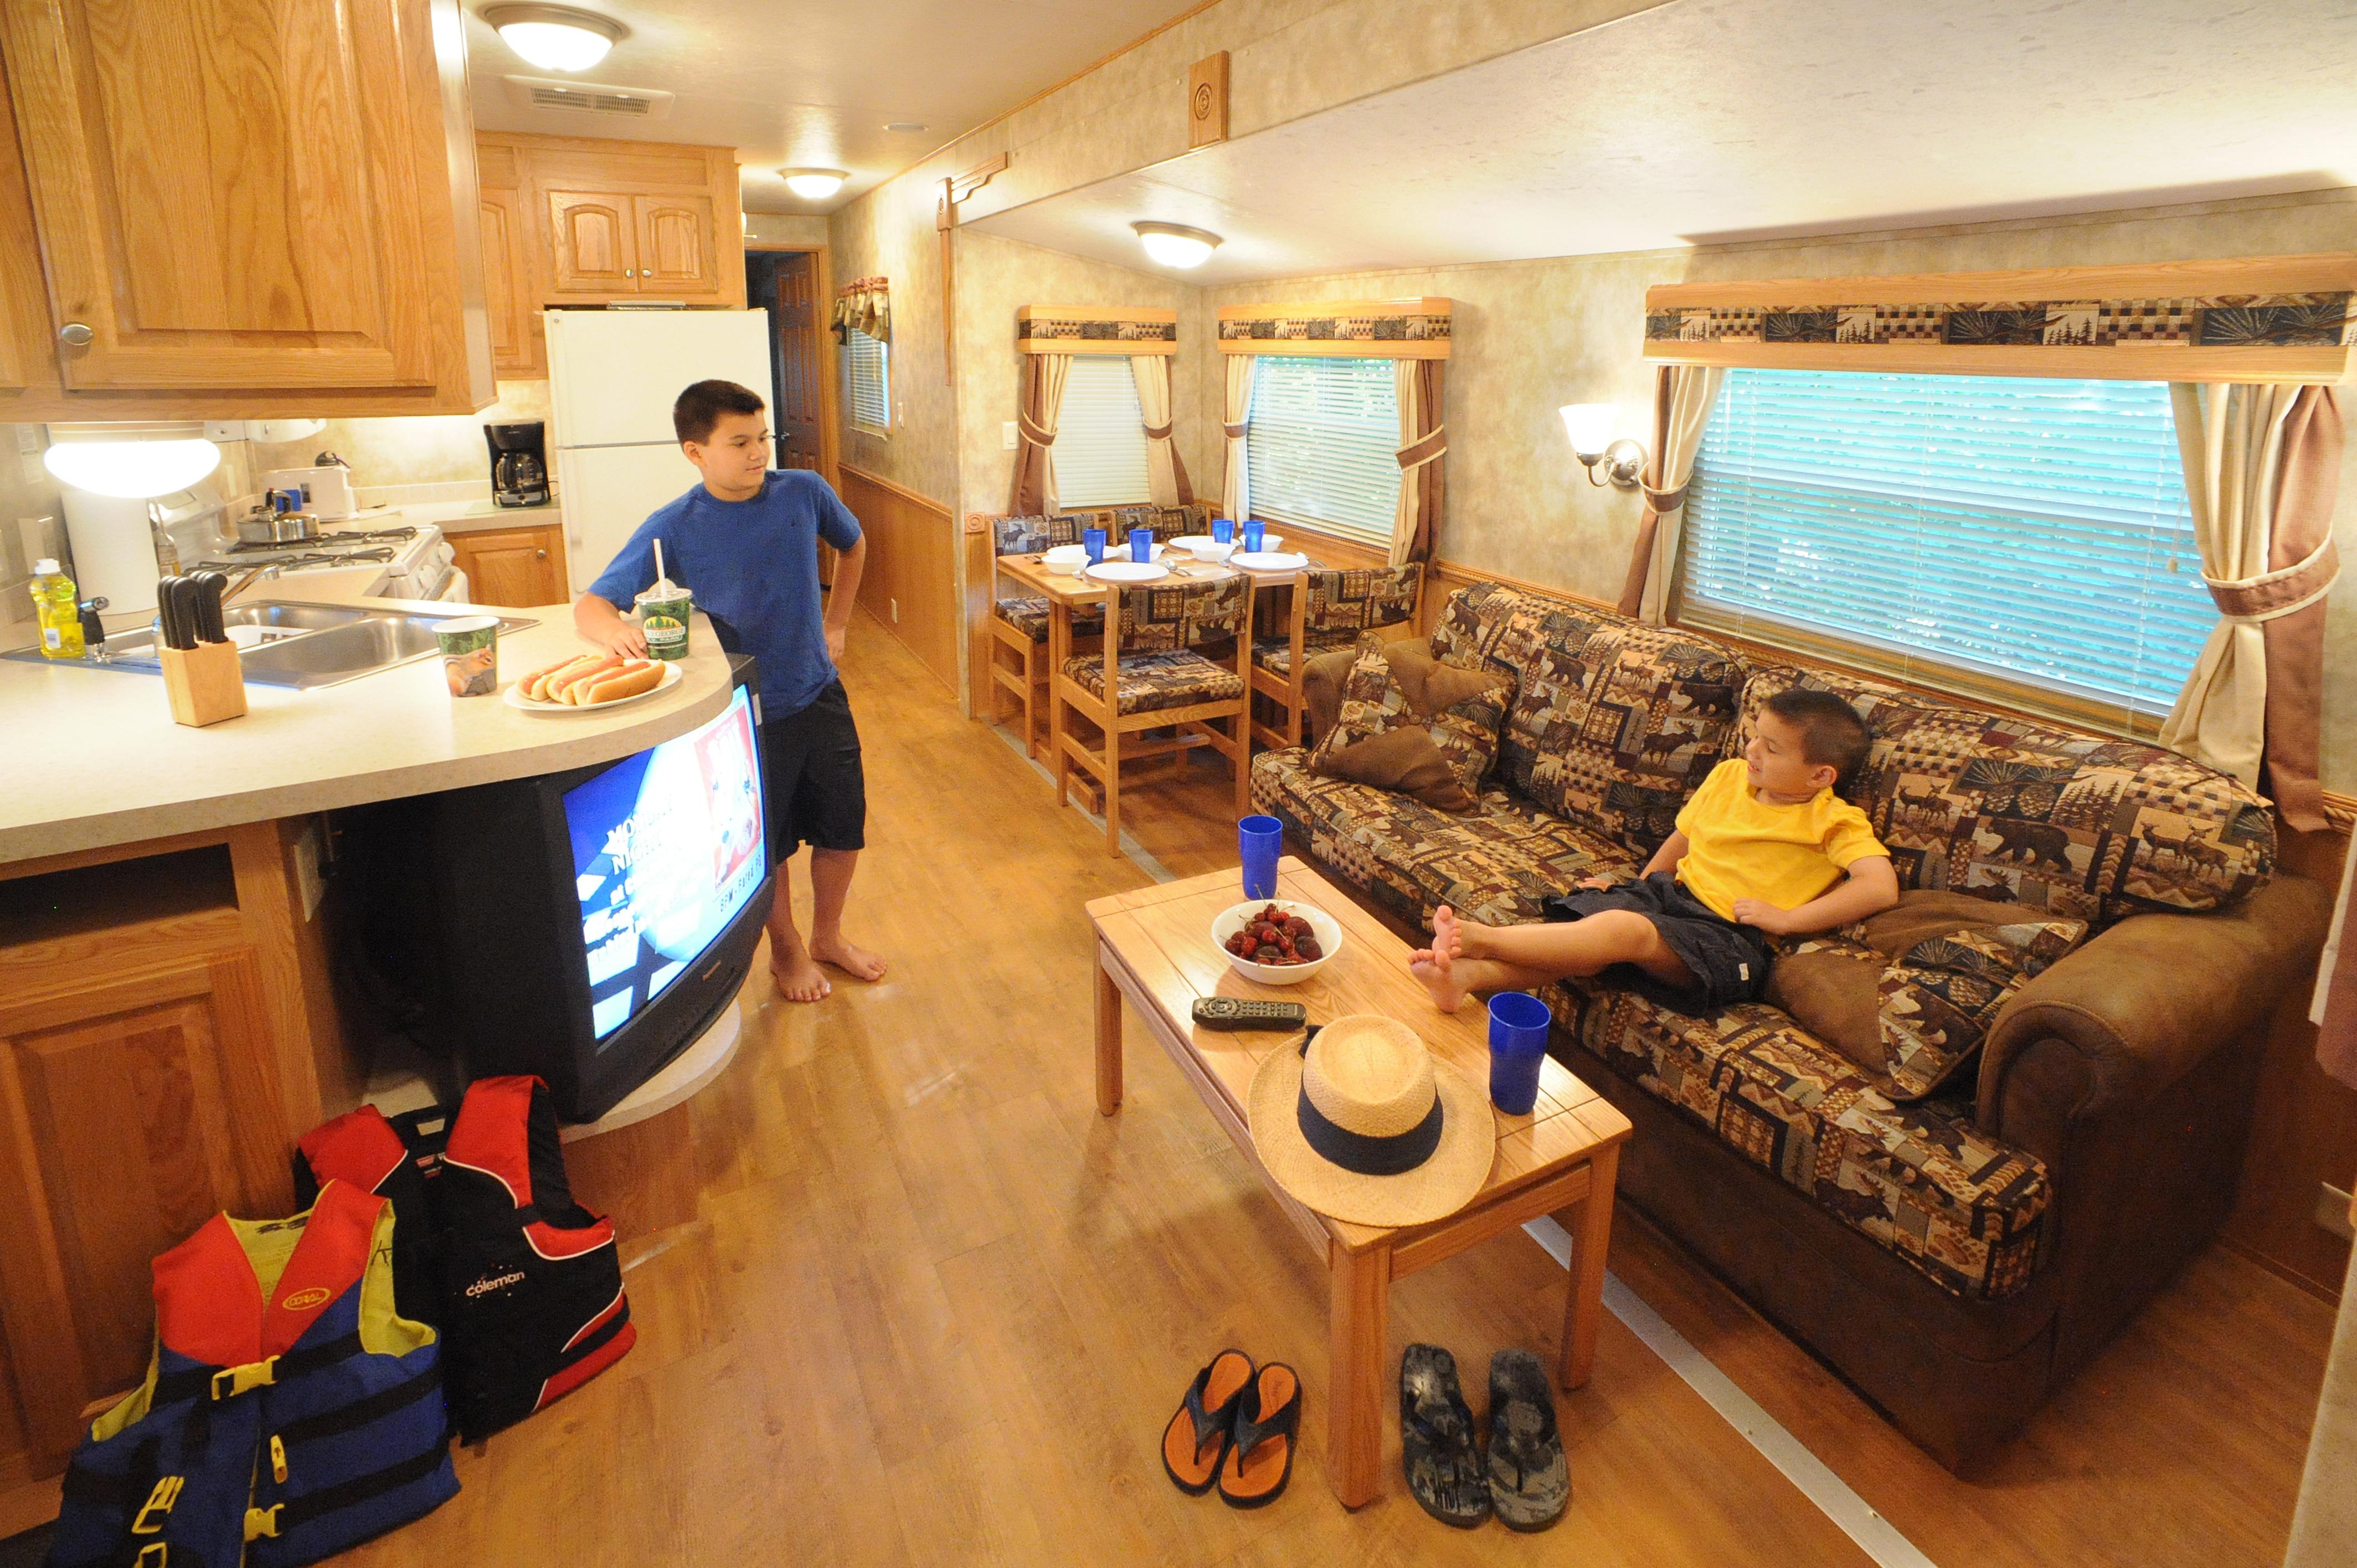 george camping saratoga new in york cabins luzerne campgrounds kabins koa lake photos jpg